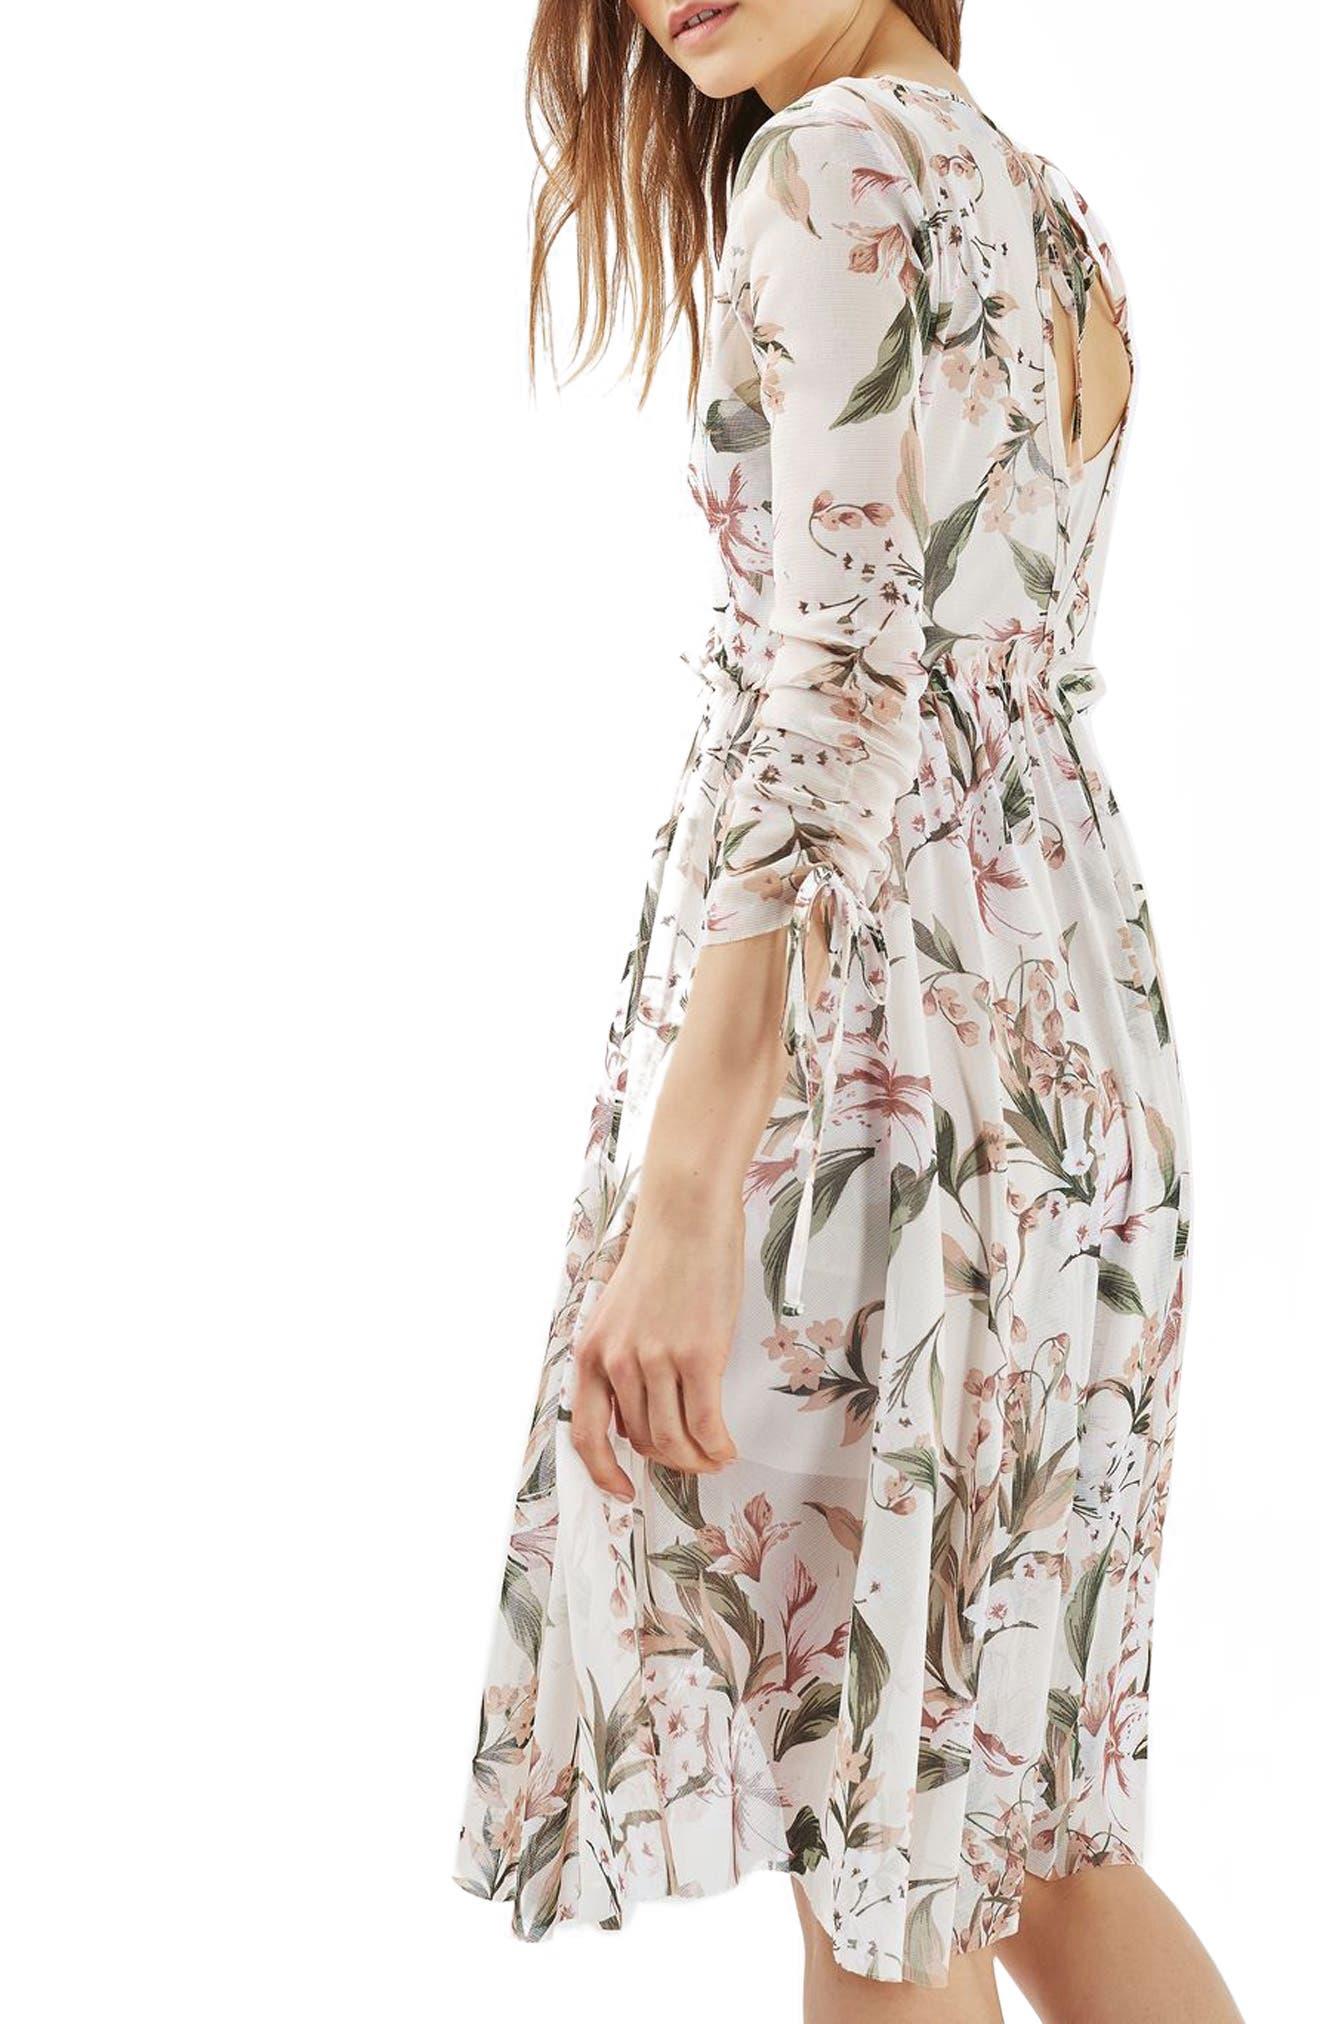 Lily Floral Mesh Dress,                             Alternate thumbnail 2, color,                             900